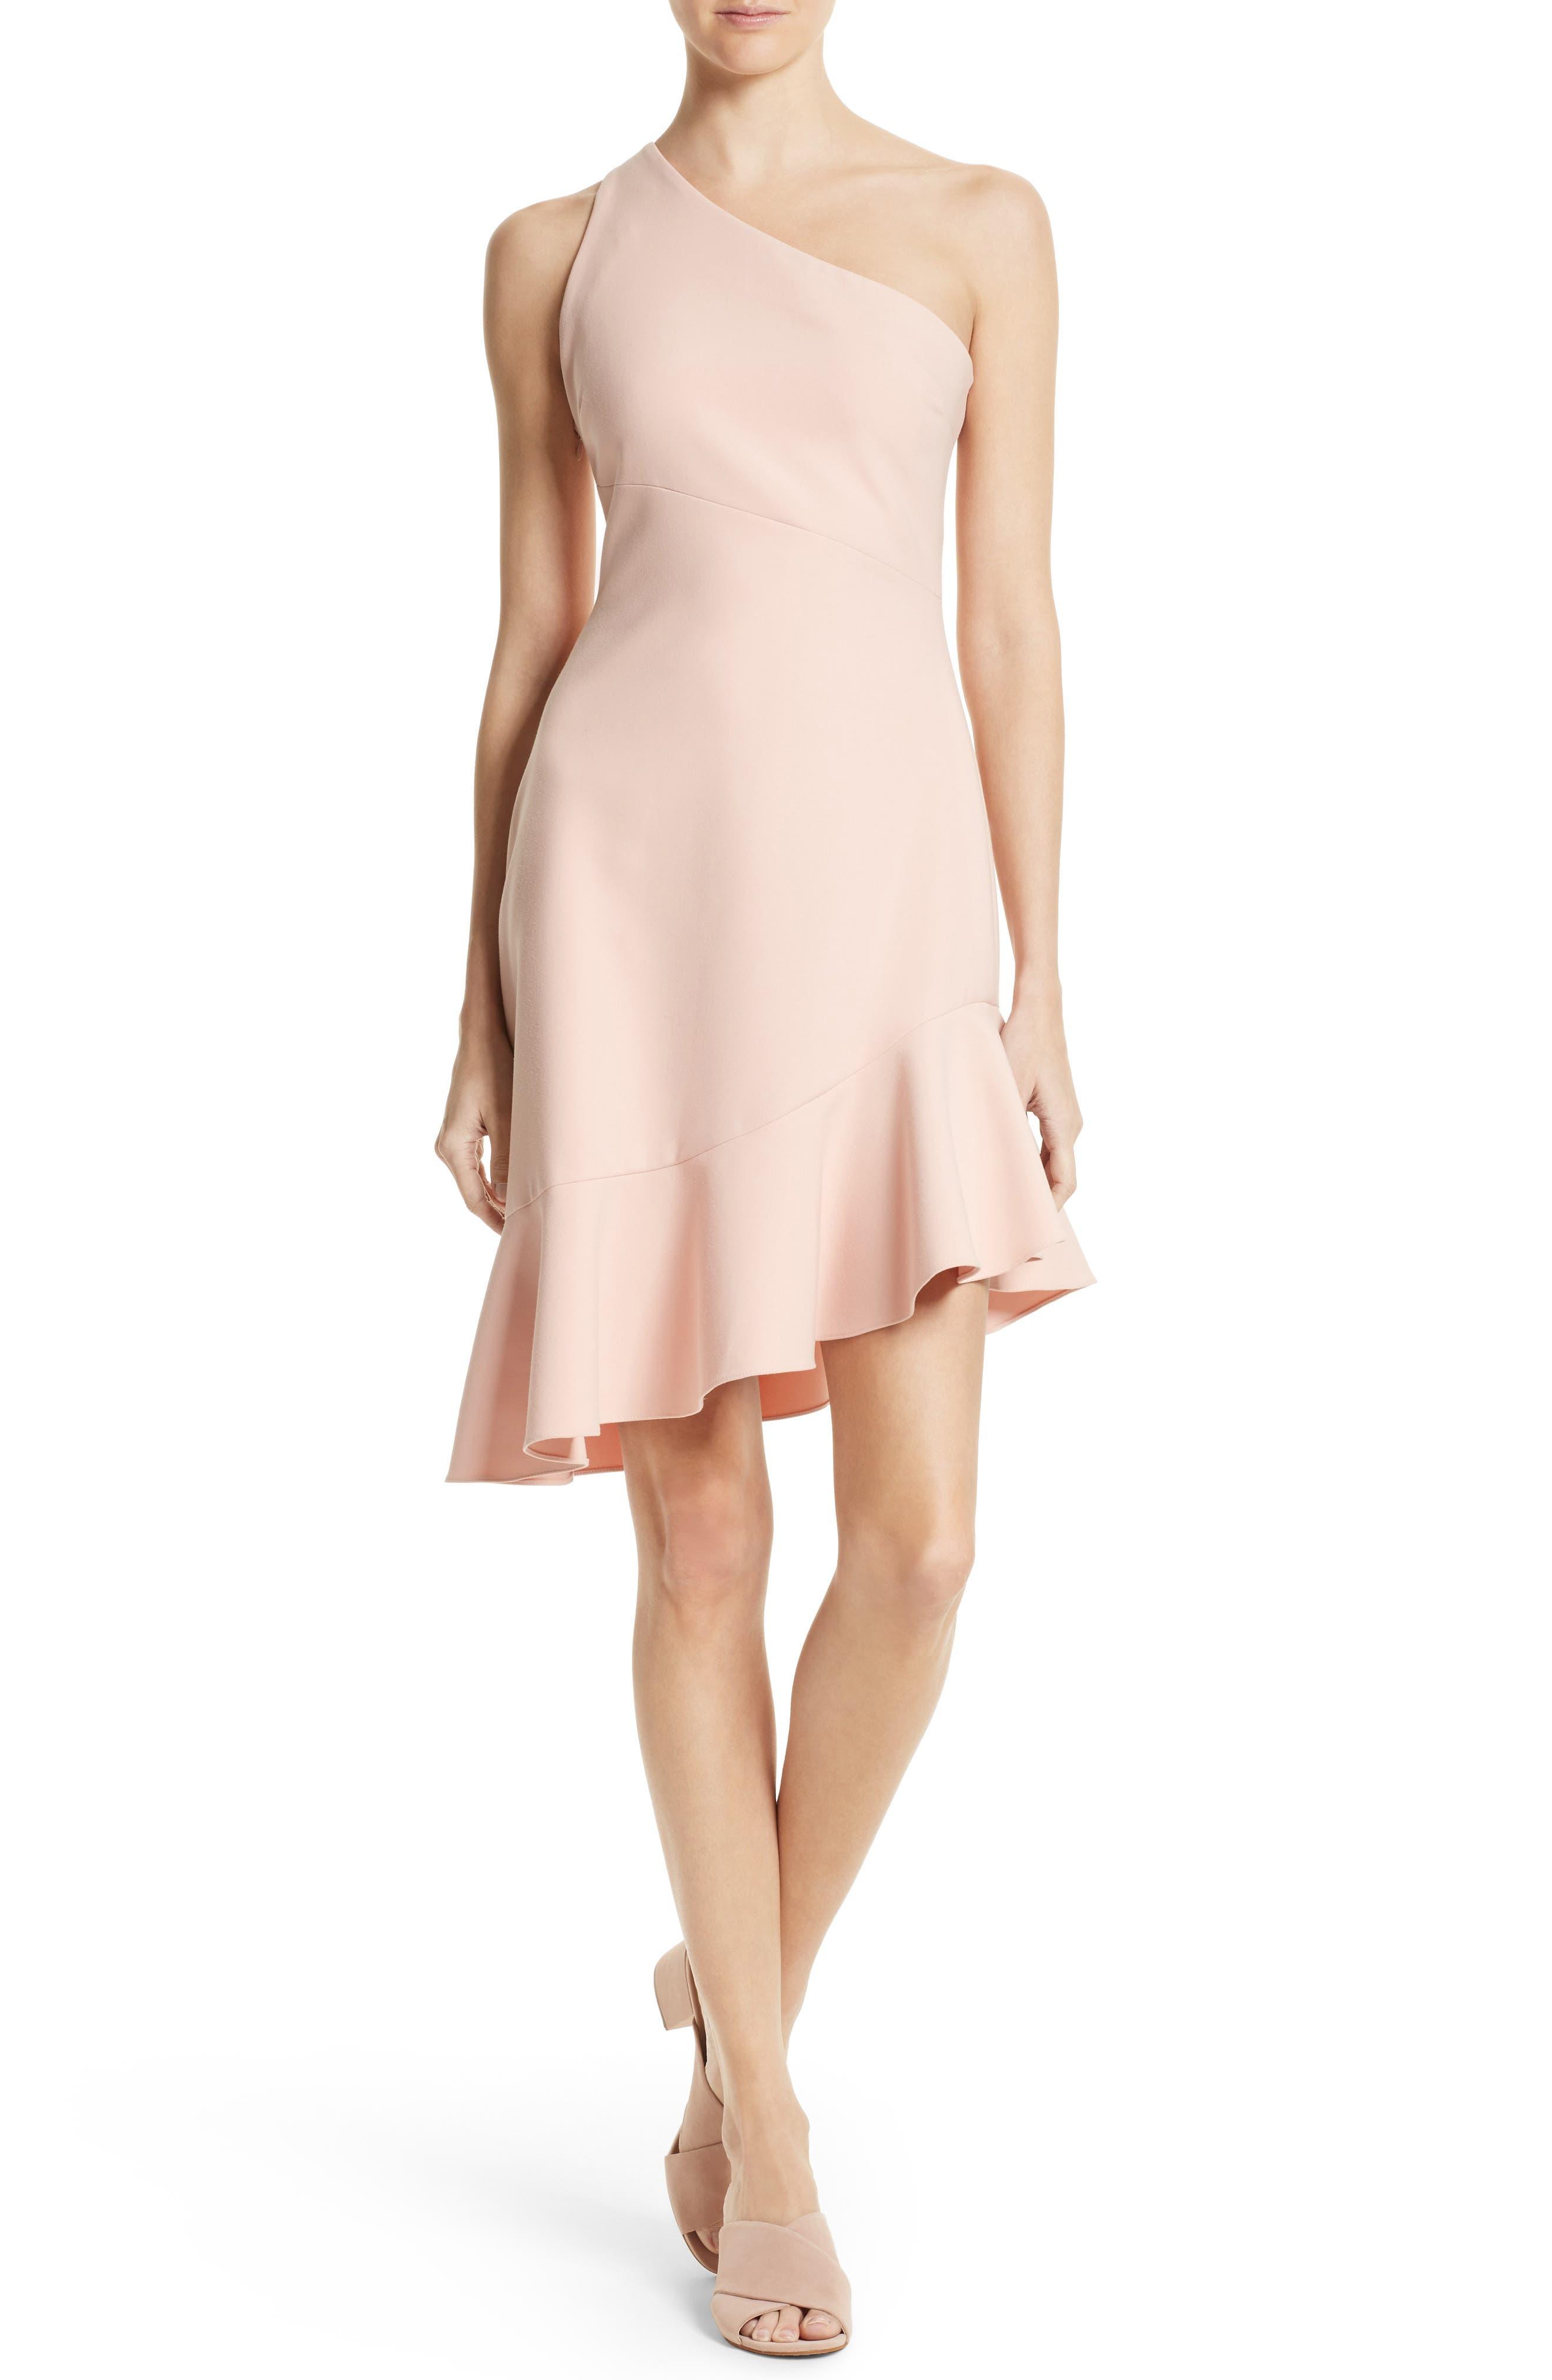 CINQ À SEPT Stella Asymmetrical One-Shoulder Dress